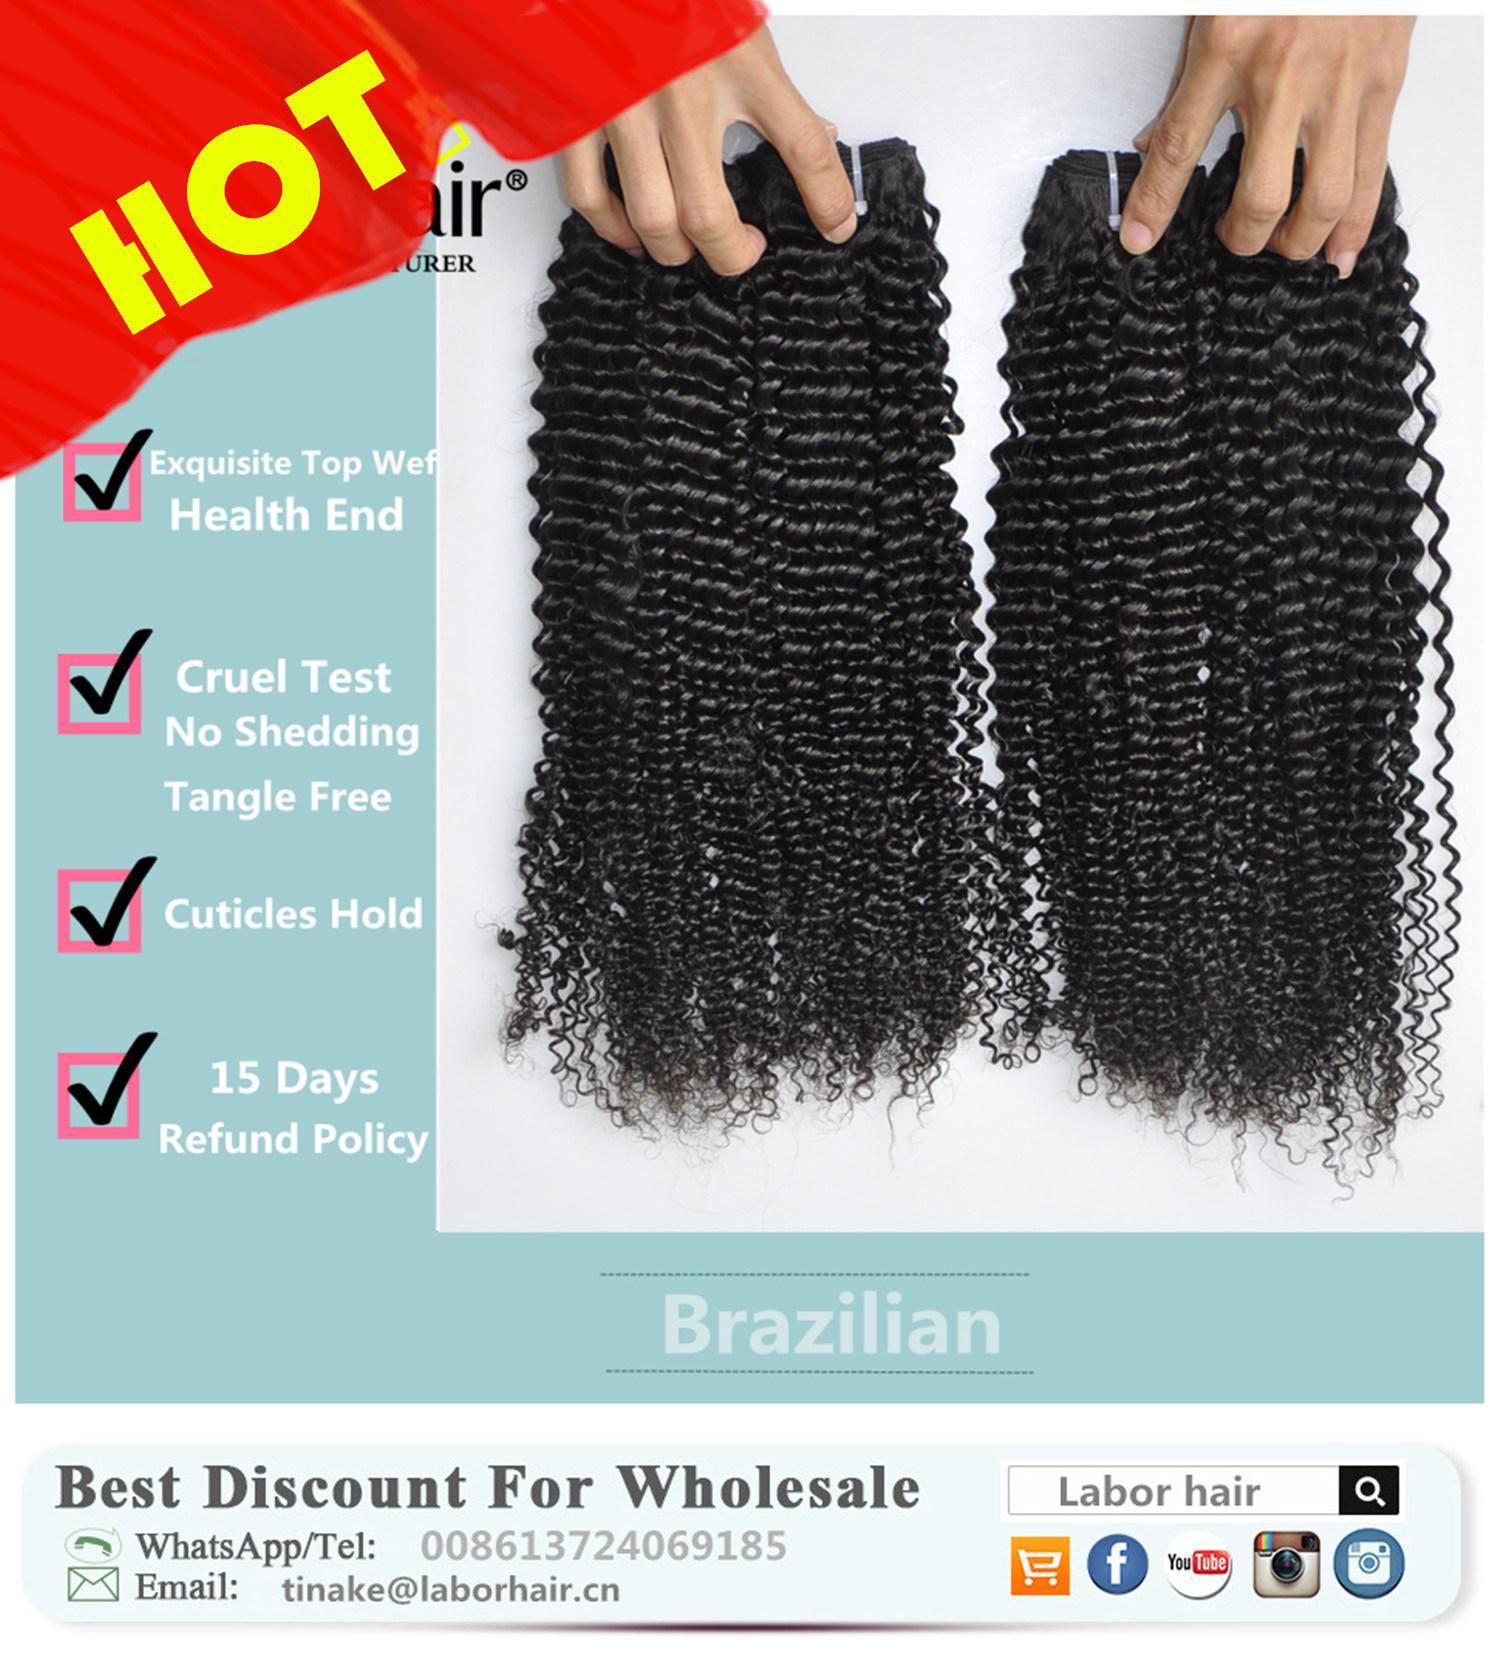 Unprocessed Labor Hair Extension 105g (+/-2g) /Bundle Natural Brazilian Virgin Hair Kinky Curly 100% Human Hair Weaves Grade 8A